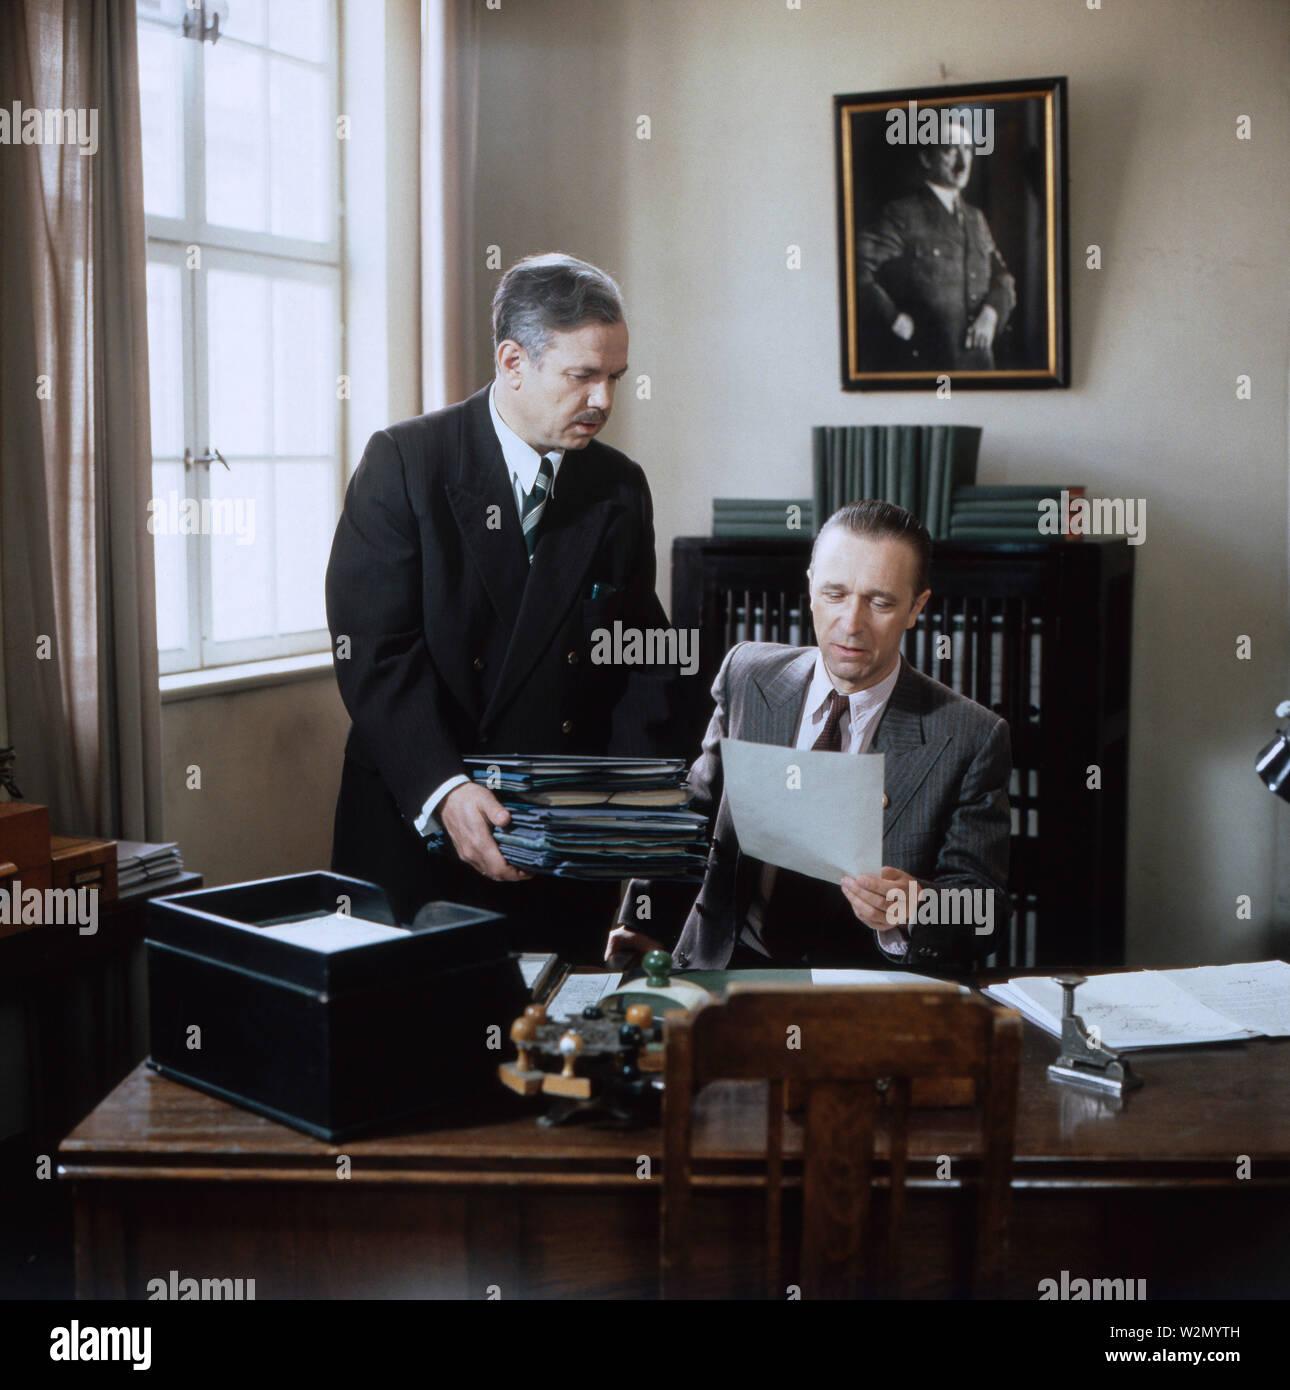 Löwengrube, Fernsehserie, Deutschland 1989 - 1992, Familienserie, Kriminalserie, Darsteller: Jörg Hube, Gerd Anthoff - Stock Image